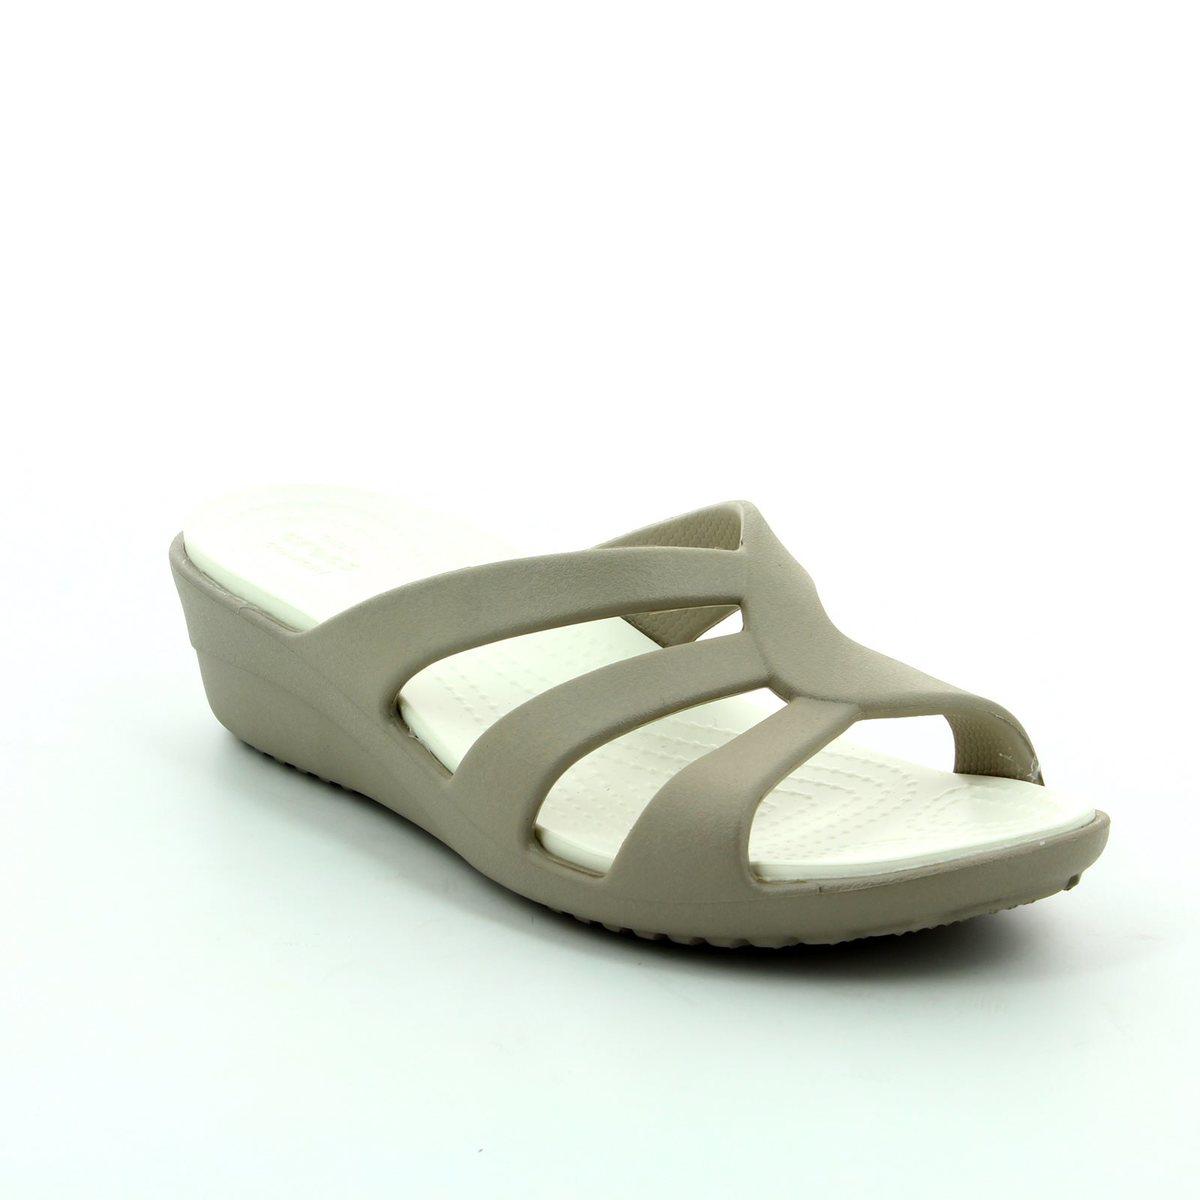 4ea4faf07019 Crocs sandals platinum sanrah strappy jpg 1200x1200 Crocs sanrah